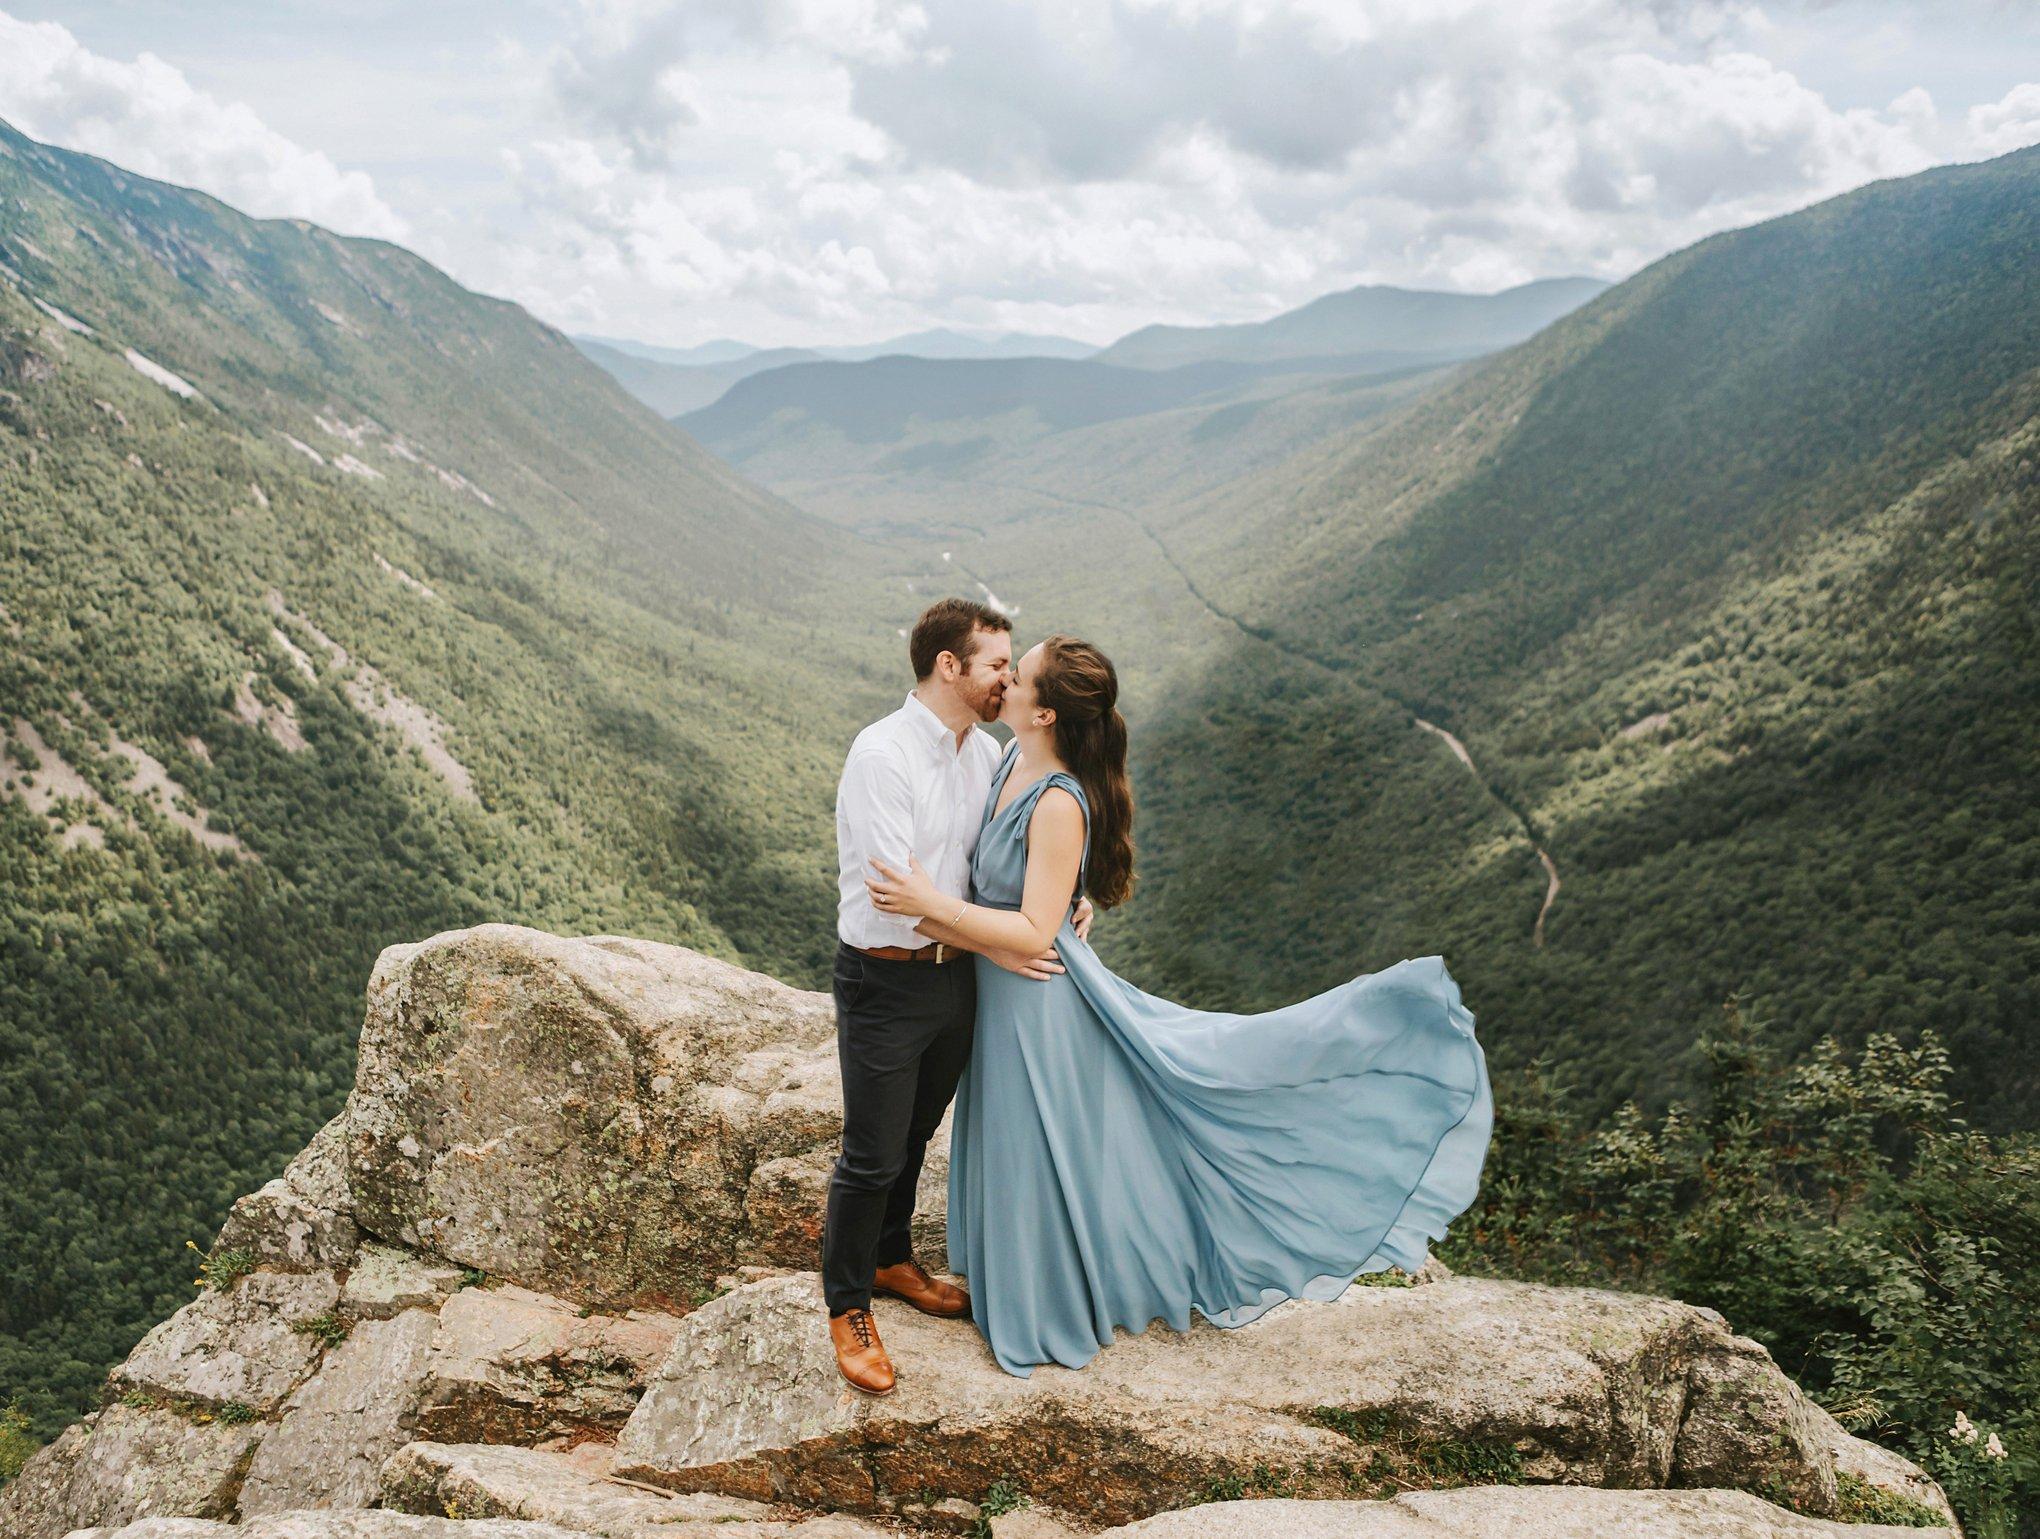 Mount-Willard-White-Mountains-Engagement-Elopement-Lena-Mirisola-14.JPG